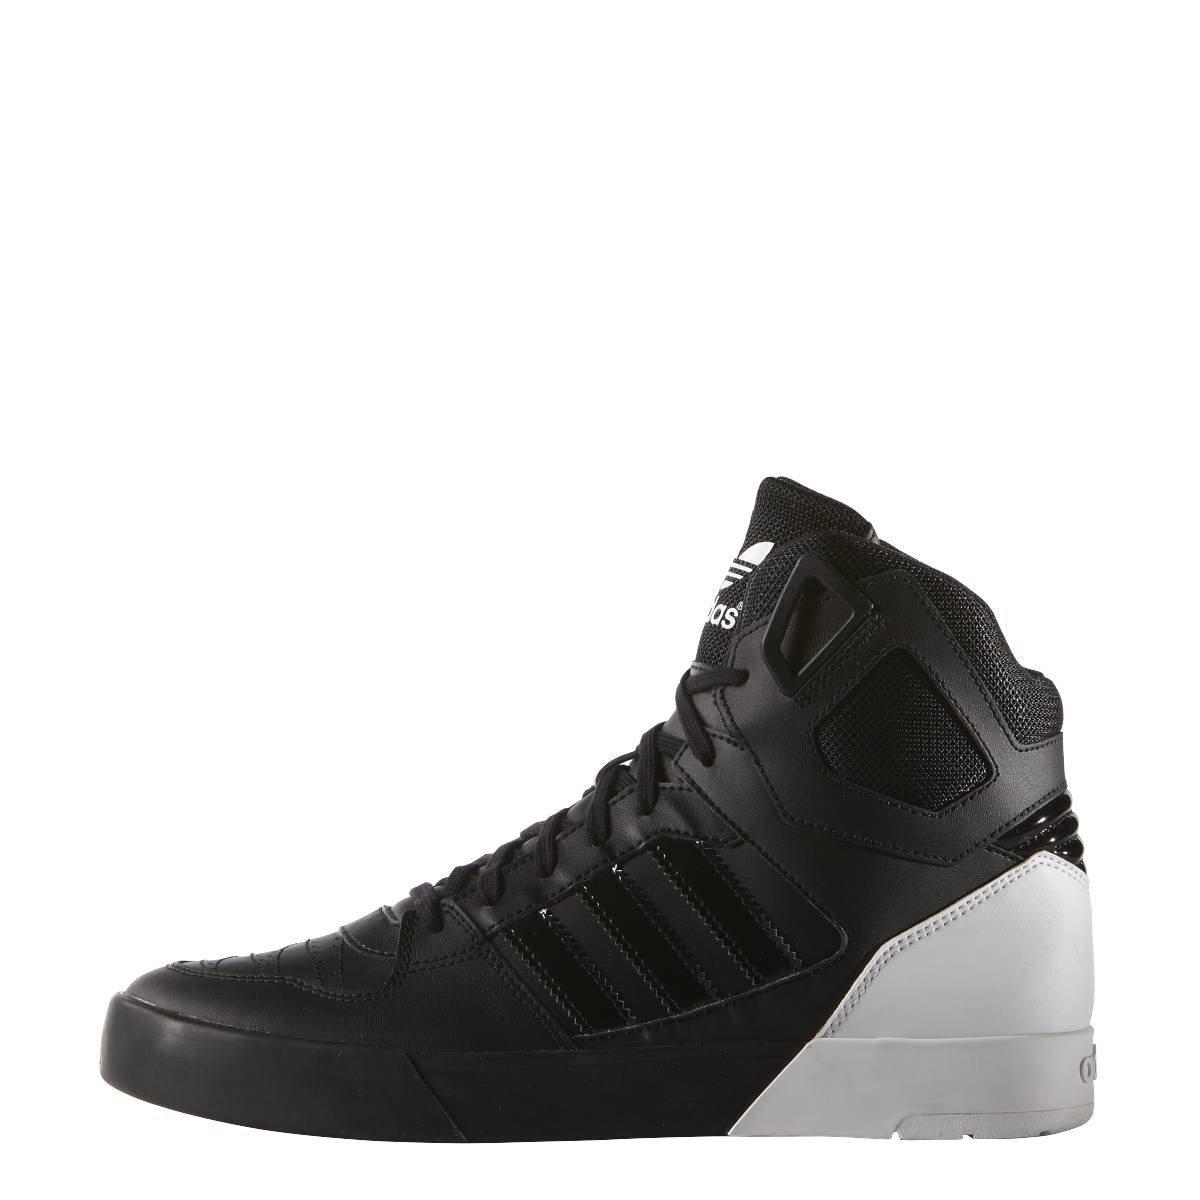 adidas Chaussures Montante Zestra Noir Homme Femme: Amazon